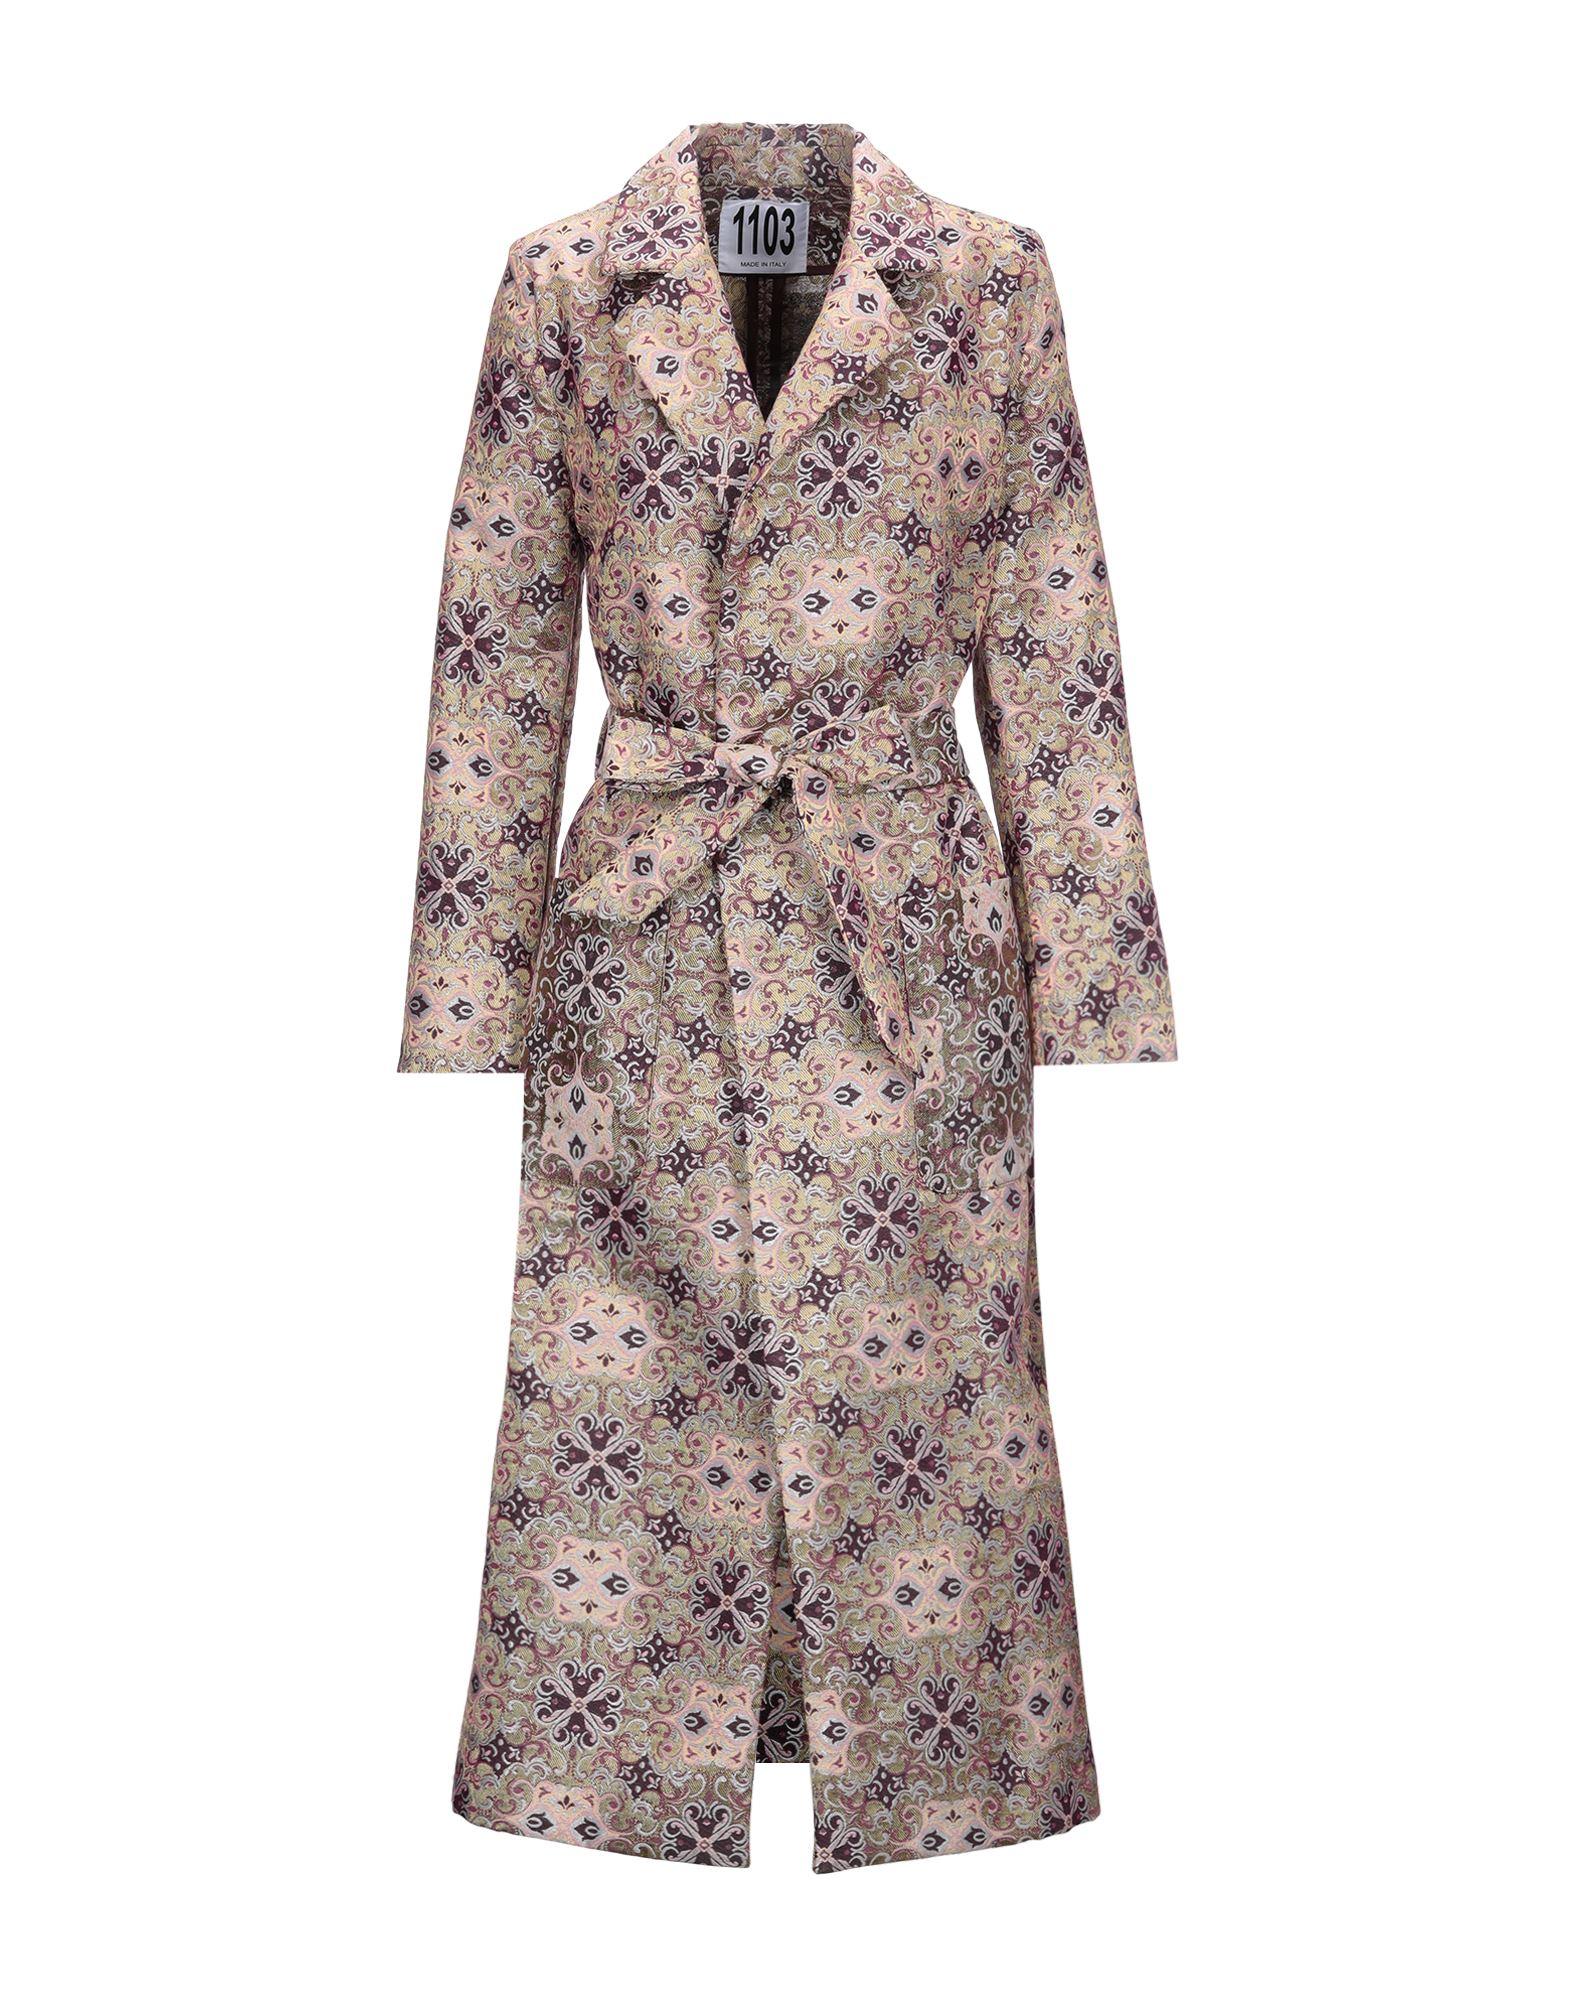 1103 Легкое пальто